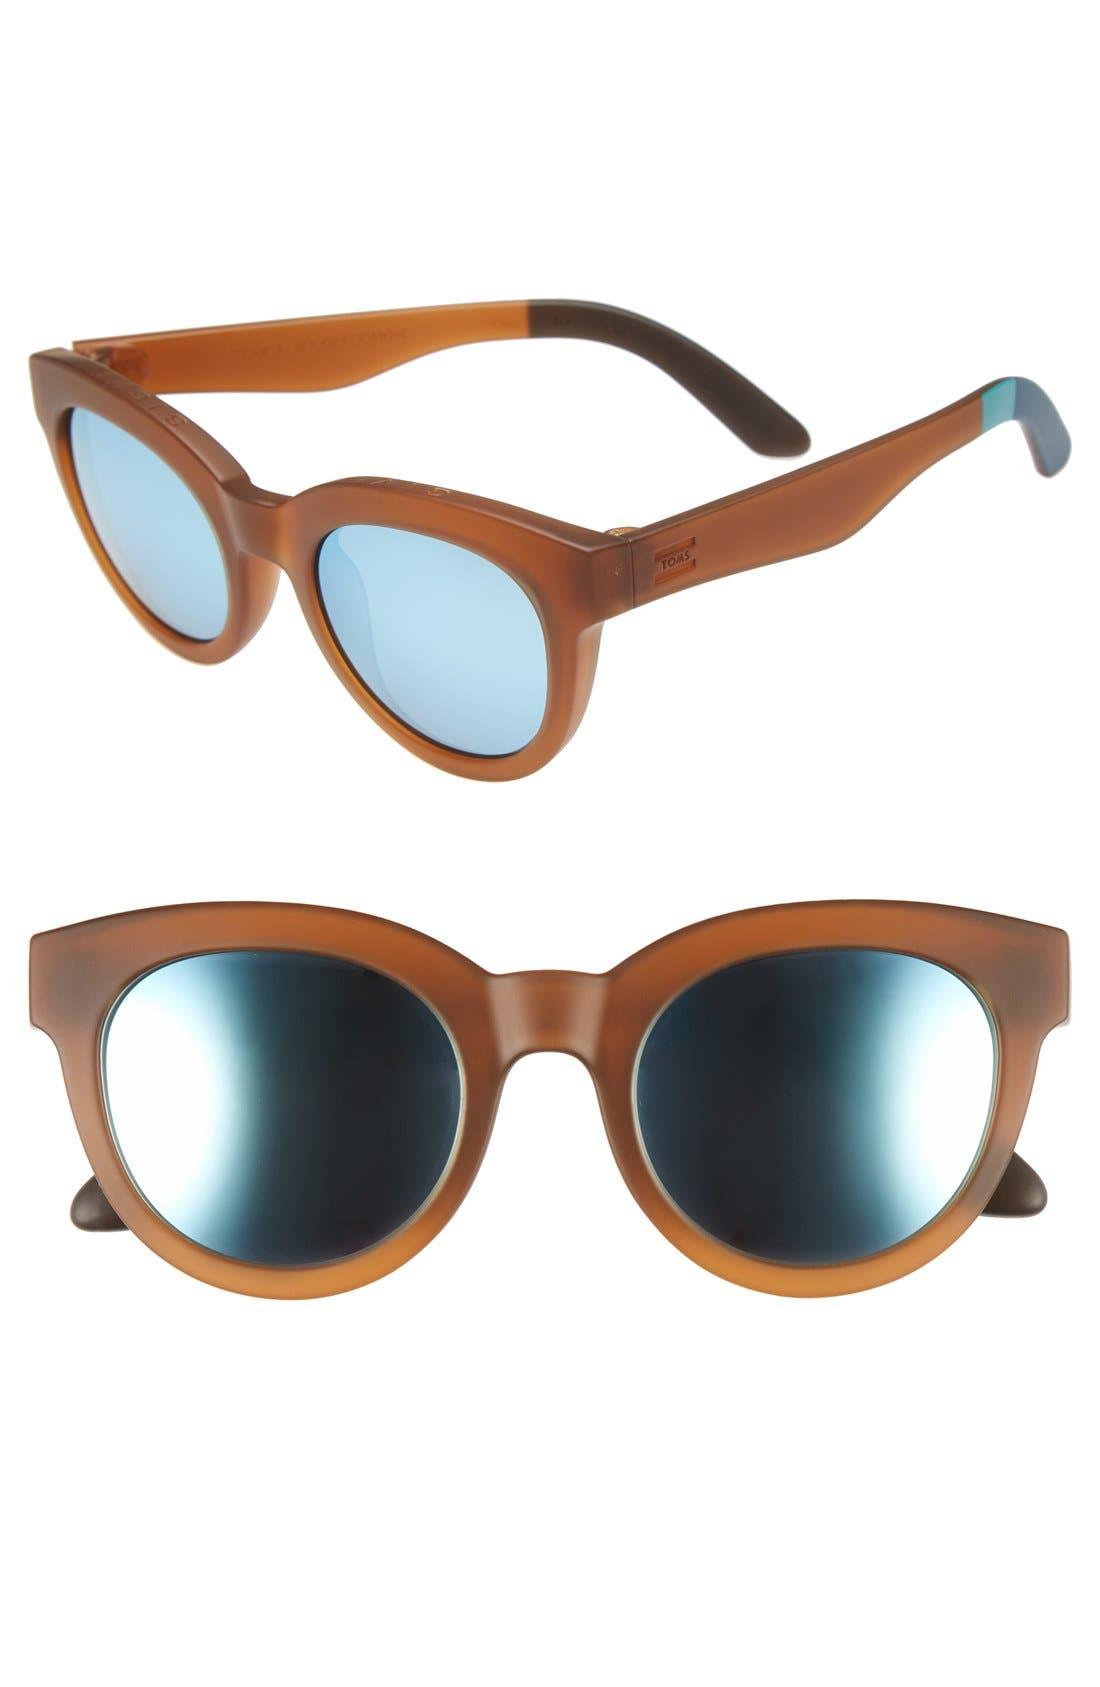 TOMS, 'Florentin' 54mm Retro Sunglasses, Main thumbnail 1, color, 200